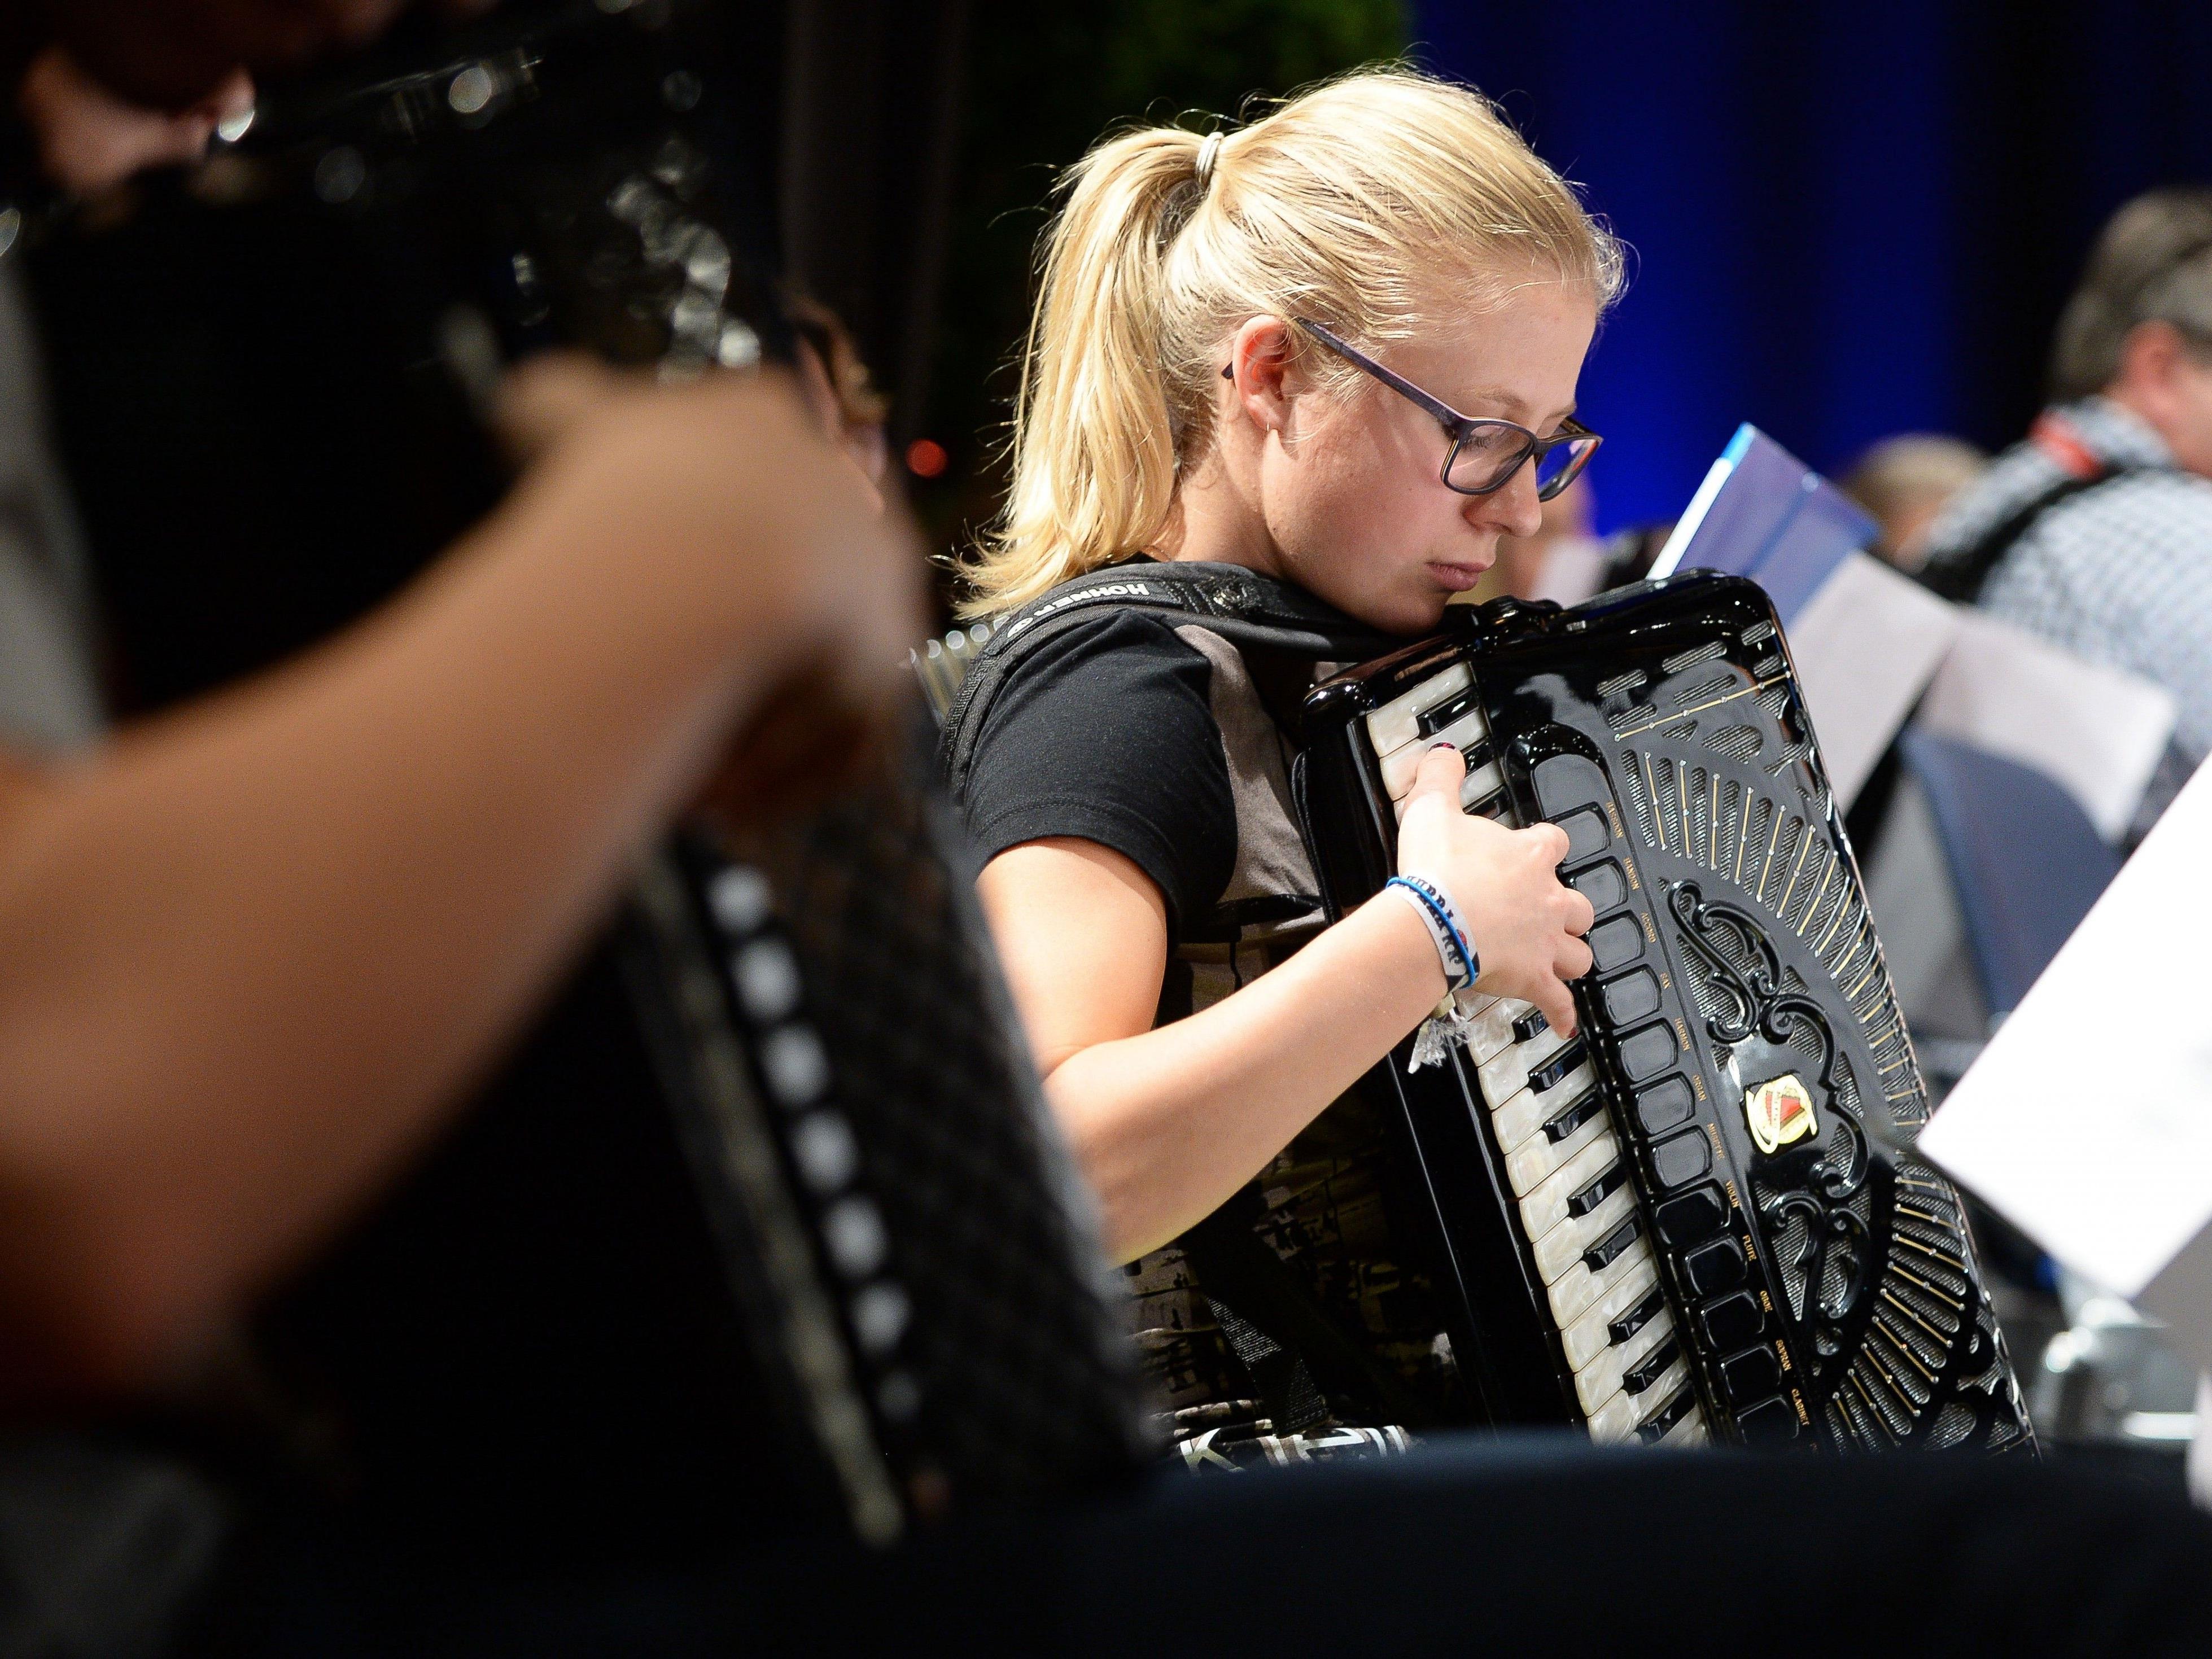 Zug um Zug, Klang um Klang: Das 18. Akkordeonfestival in Wien